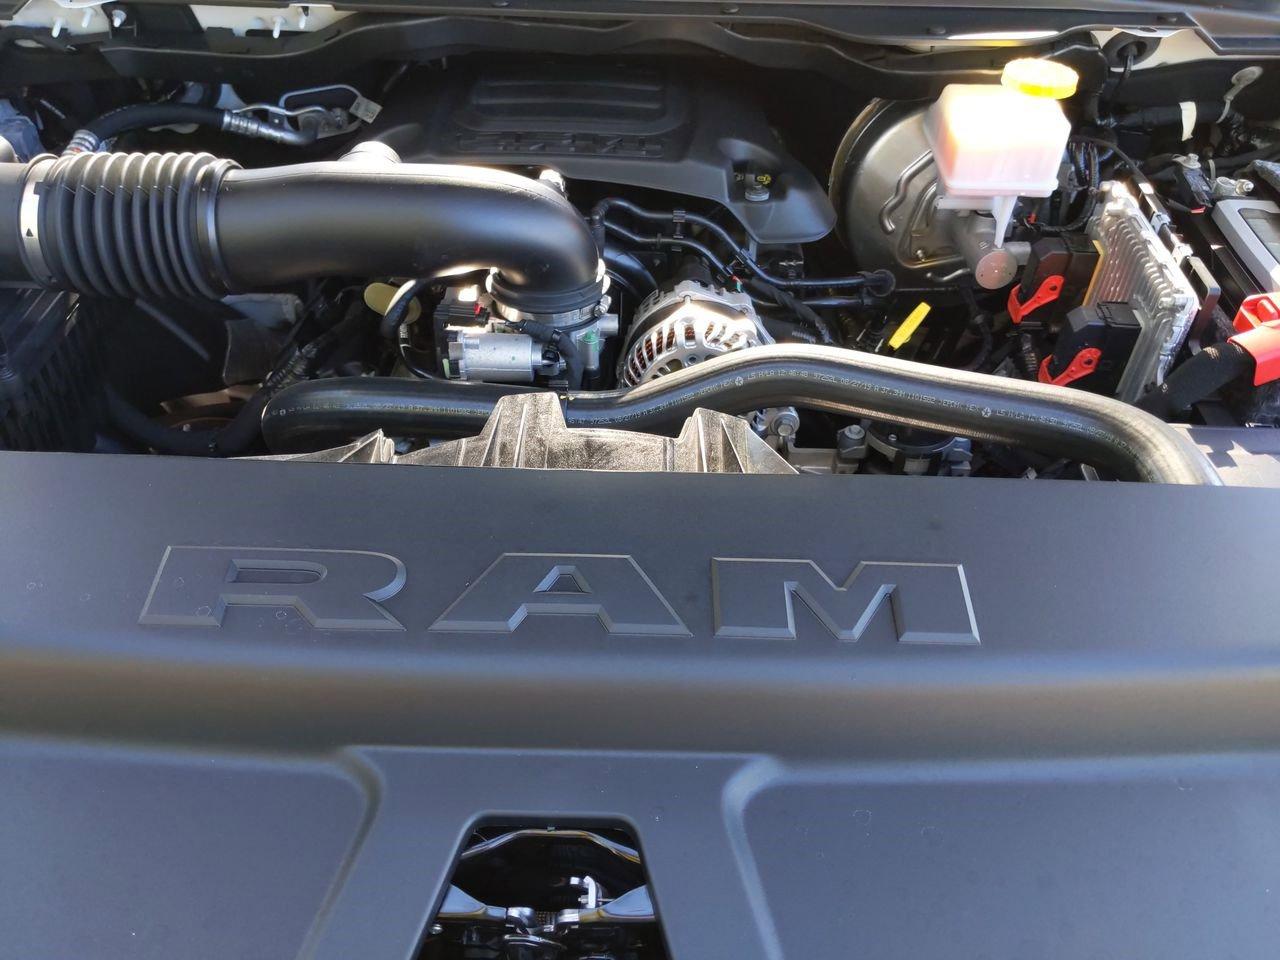 Pre-Owned 2020 Ram 1500 Big Horn